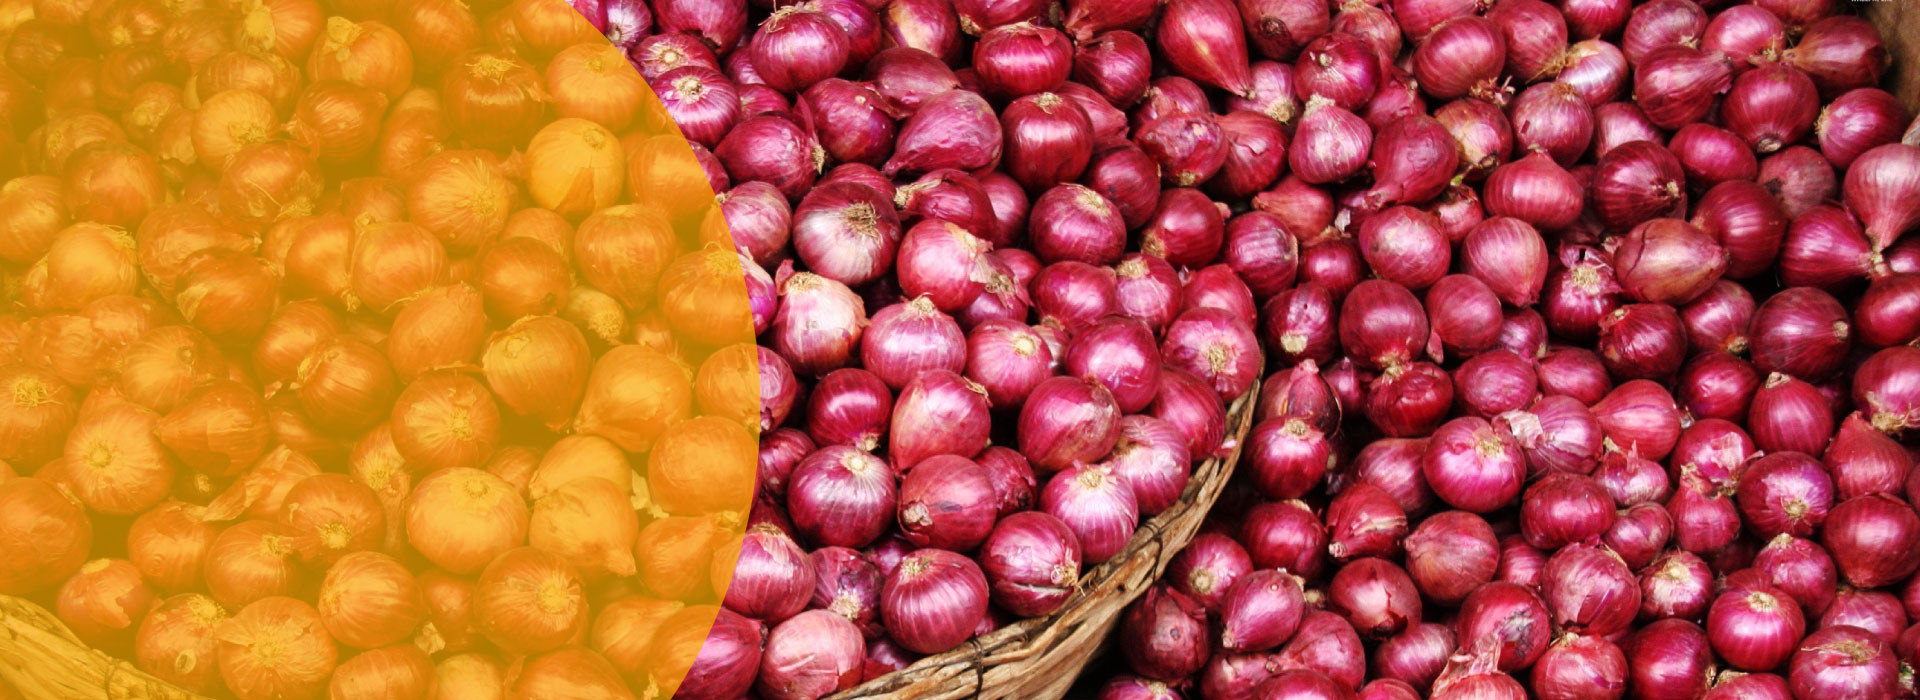 Diaz onion suppliers